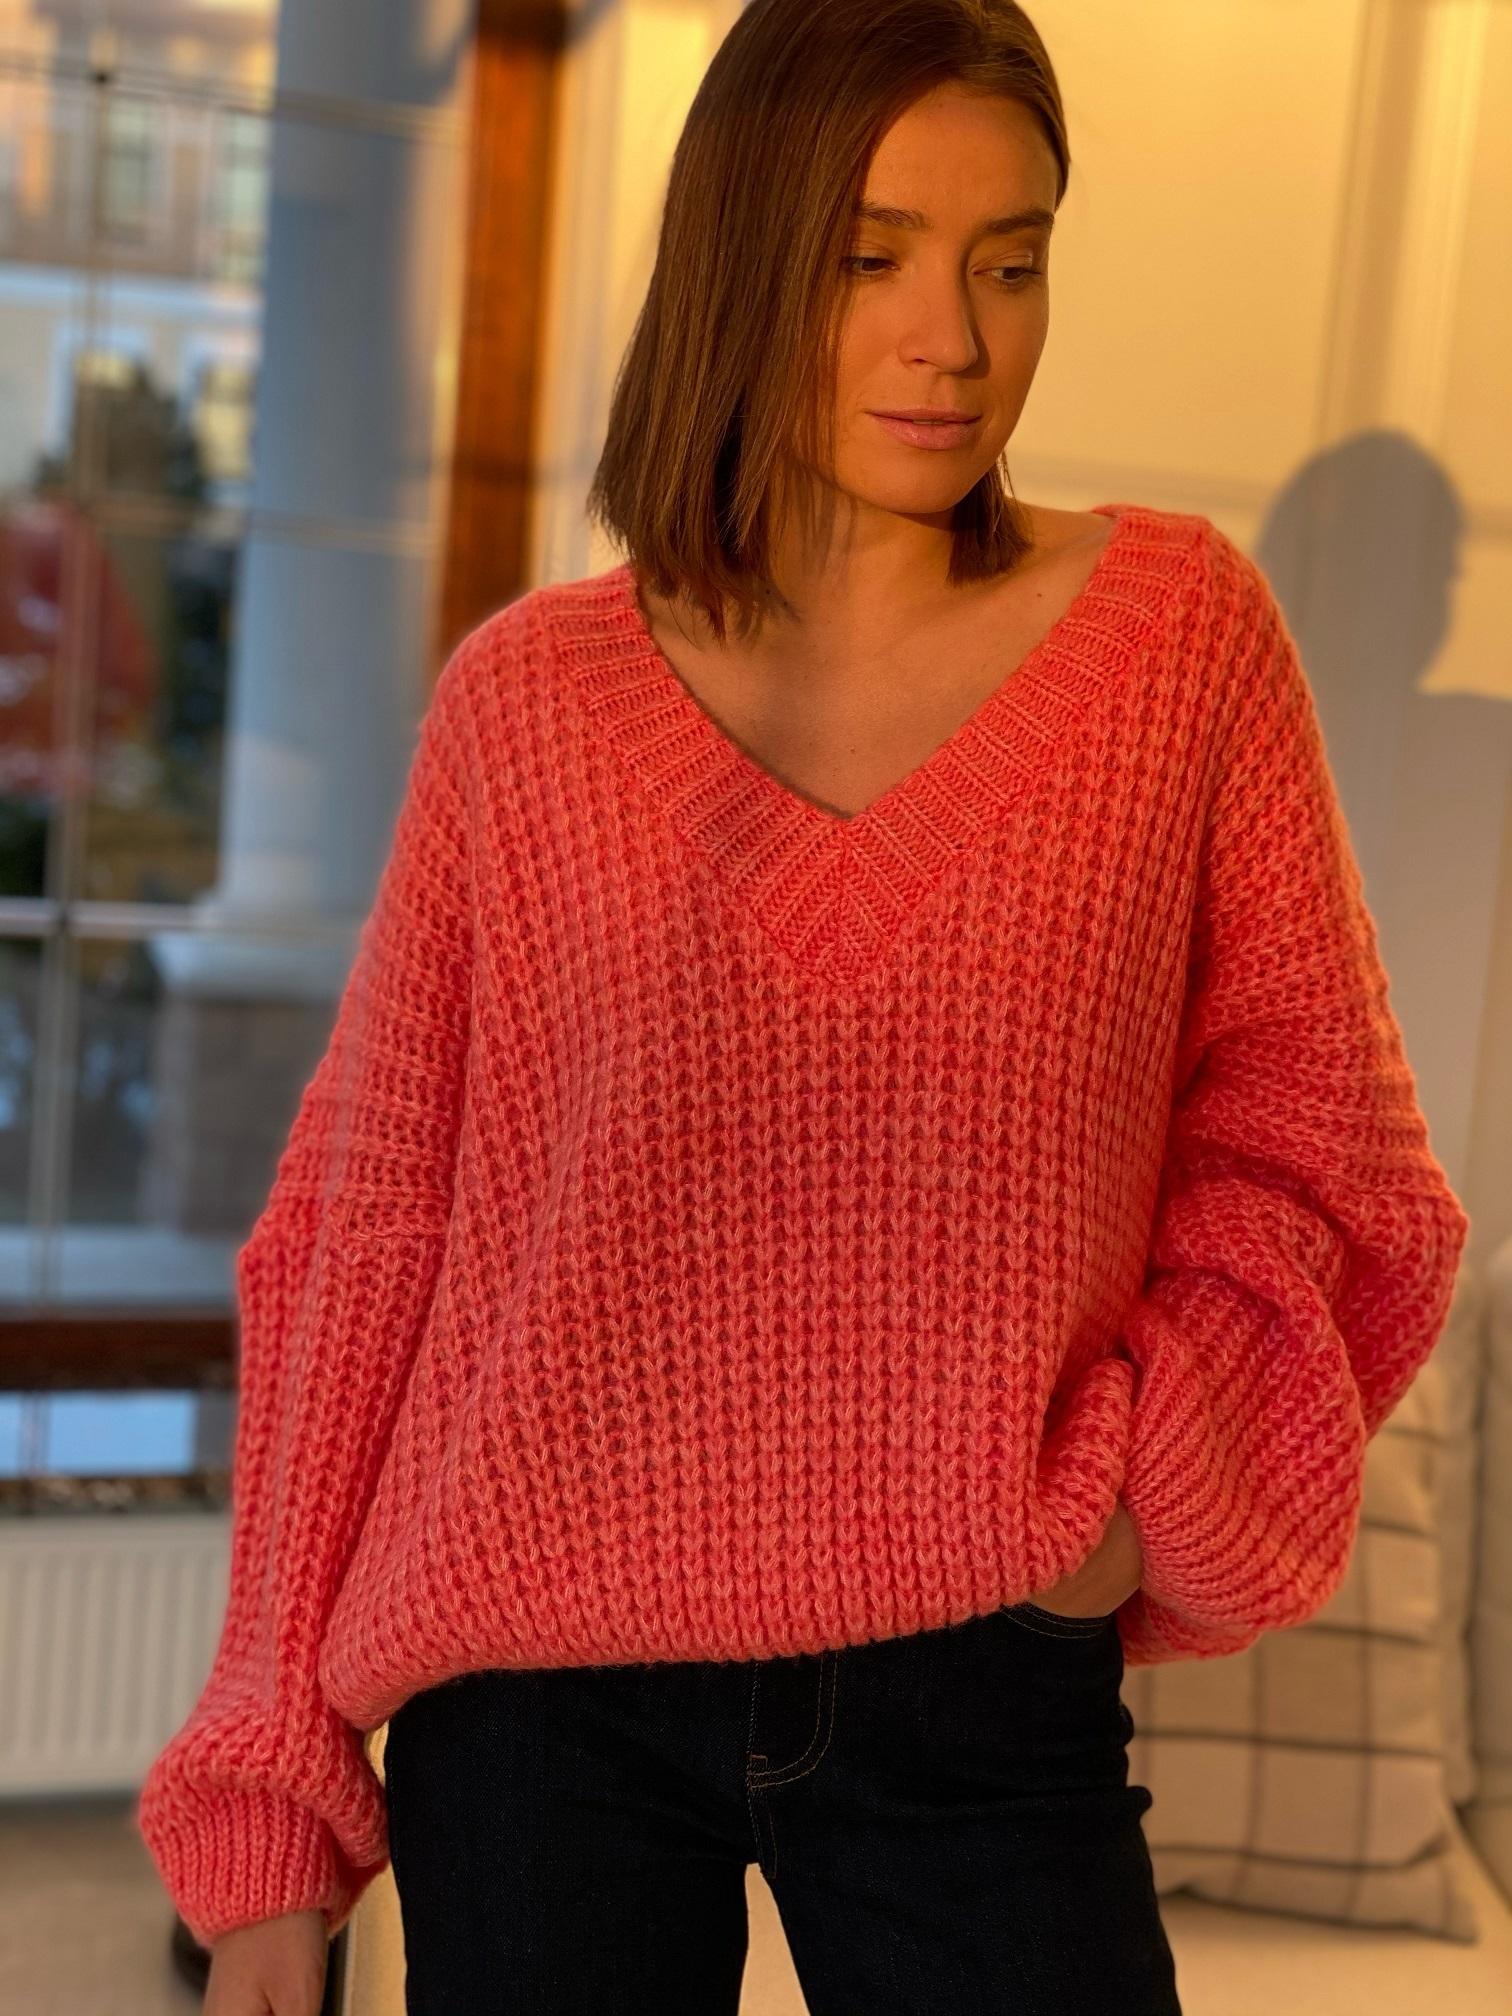 Пуловер, Pola, Twiggy (коралловый)